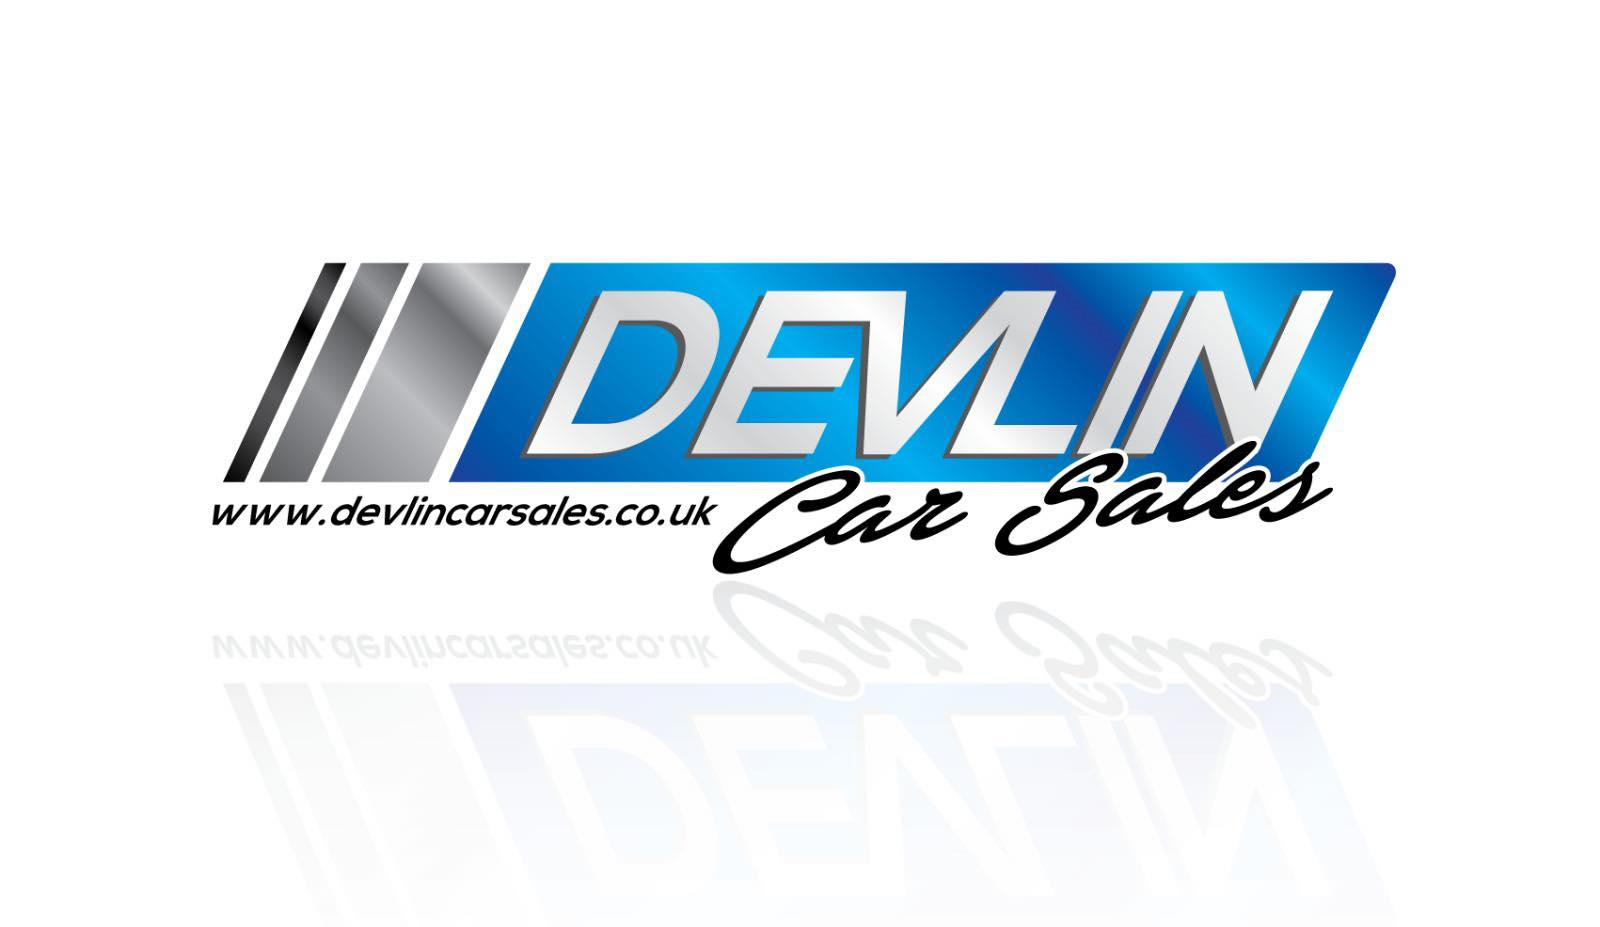 Devlin Car sales, COOKSTOWN